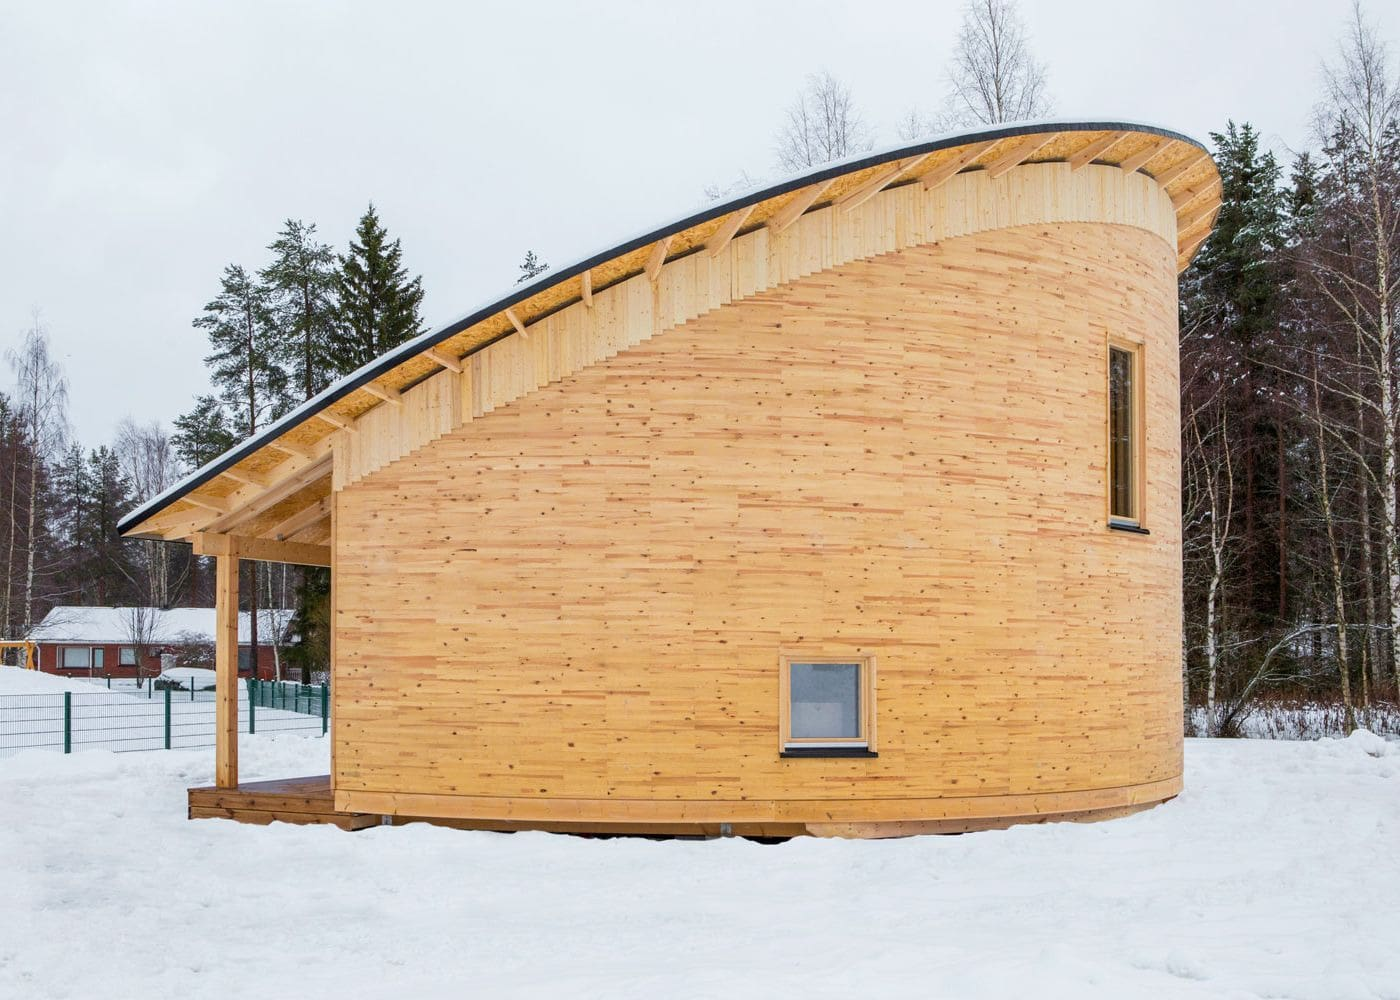 AaltoHaitek_Aalto Wood_paivakoti Toholampi_Ateljee Kuvastin